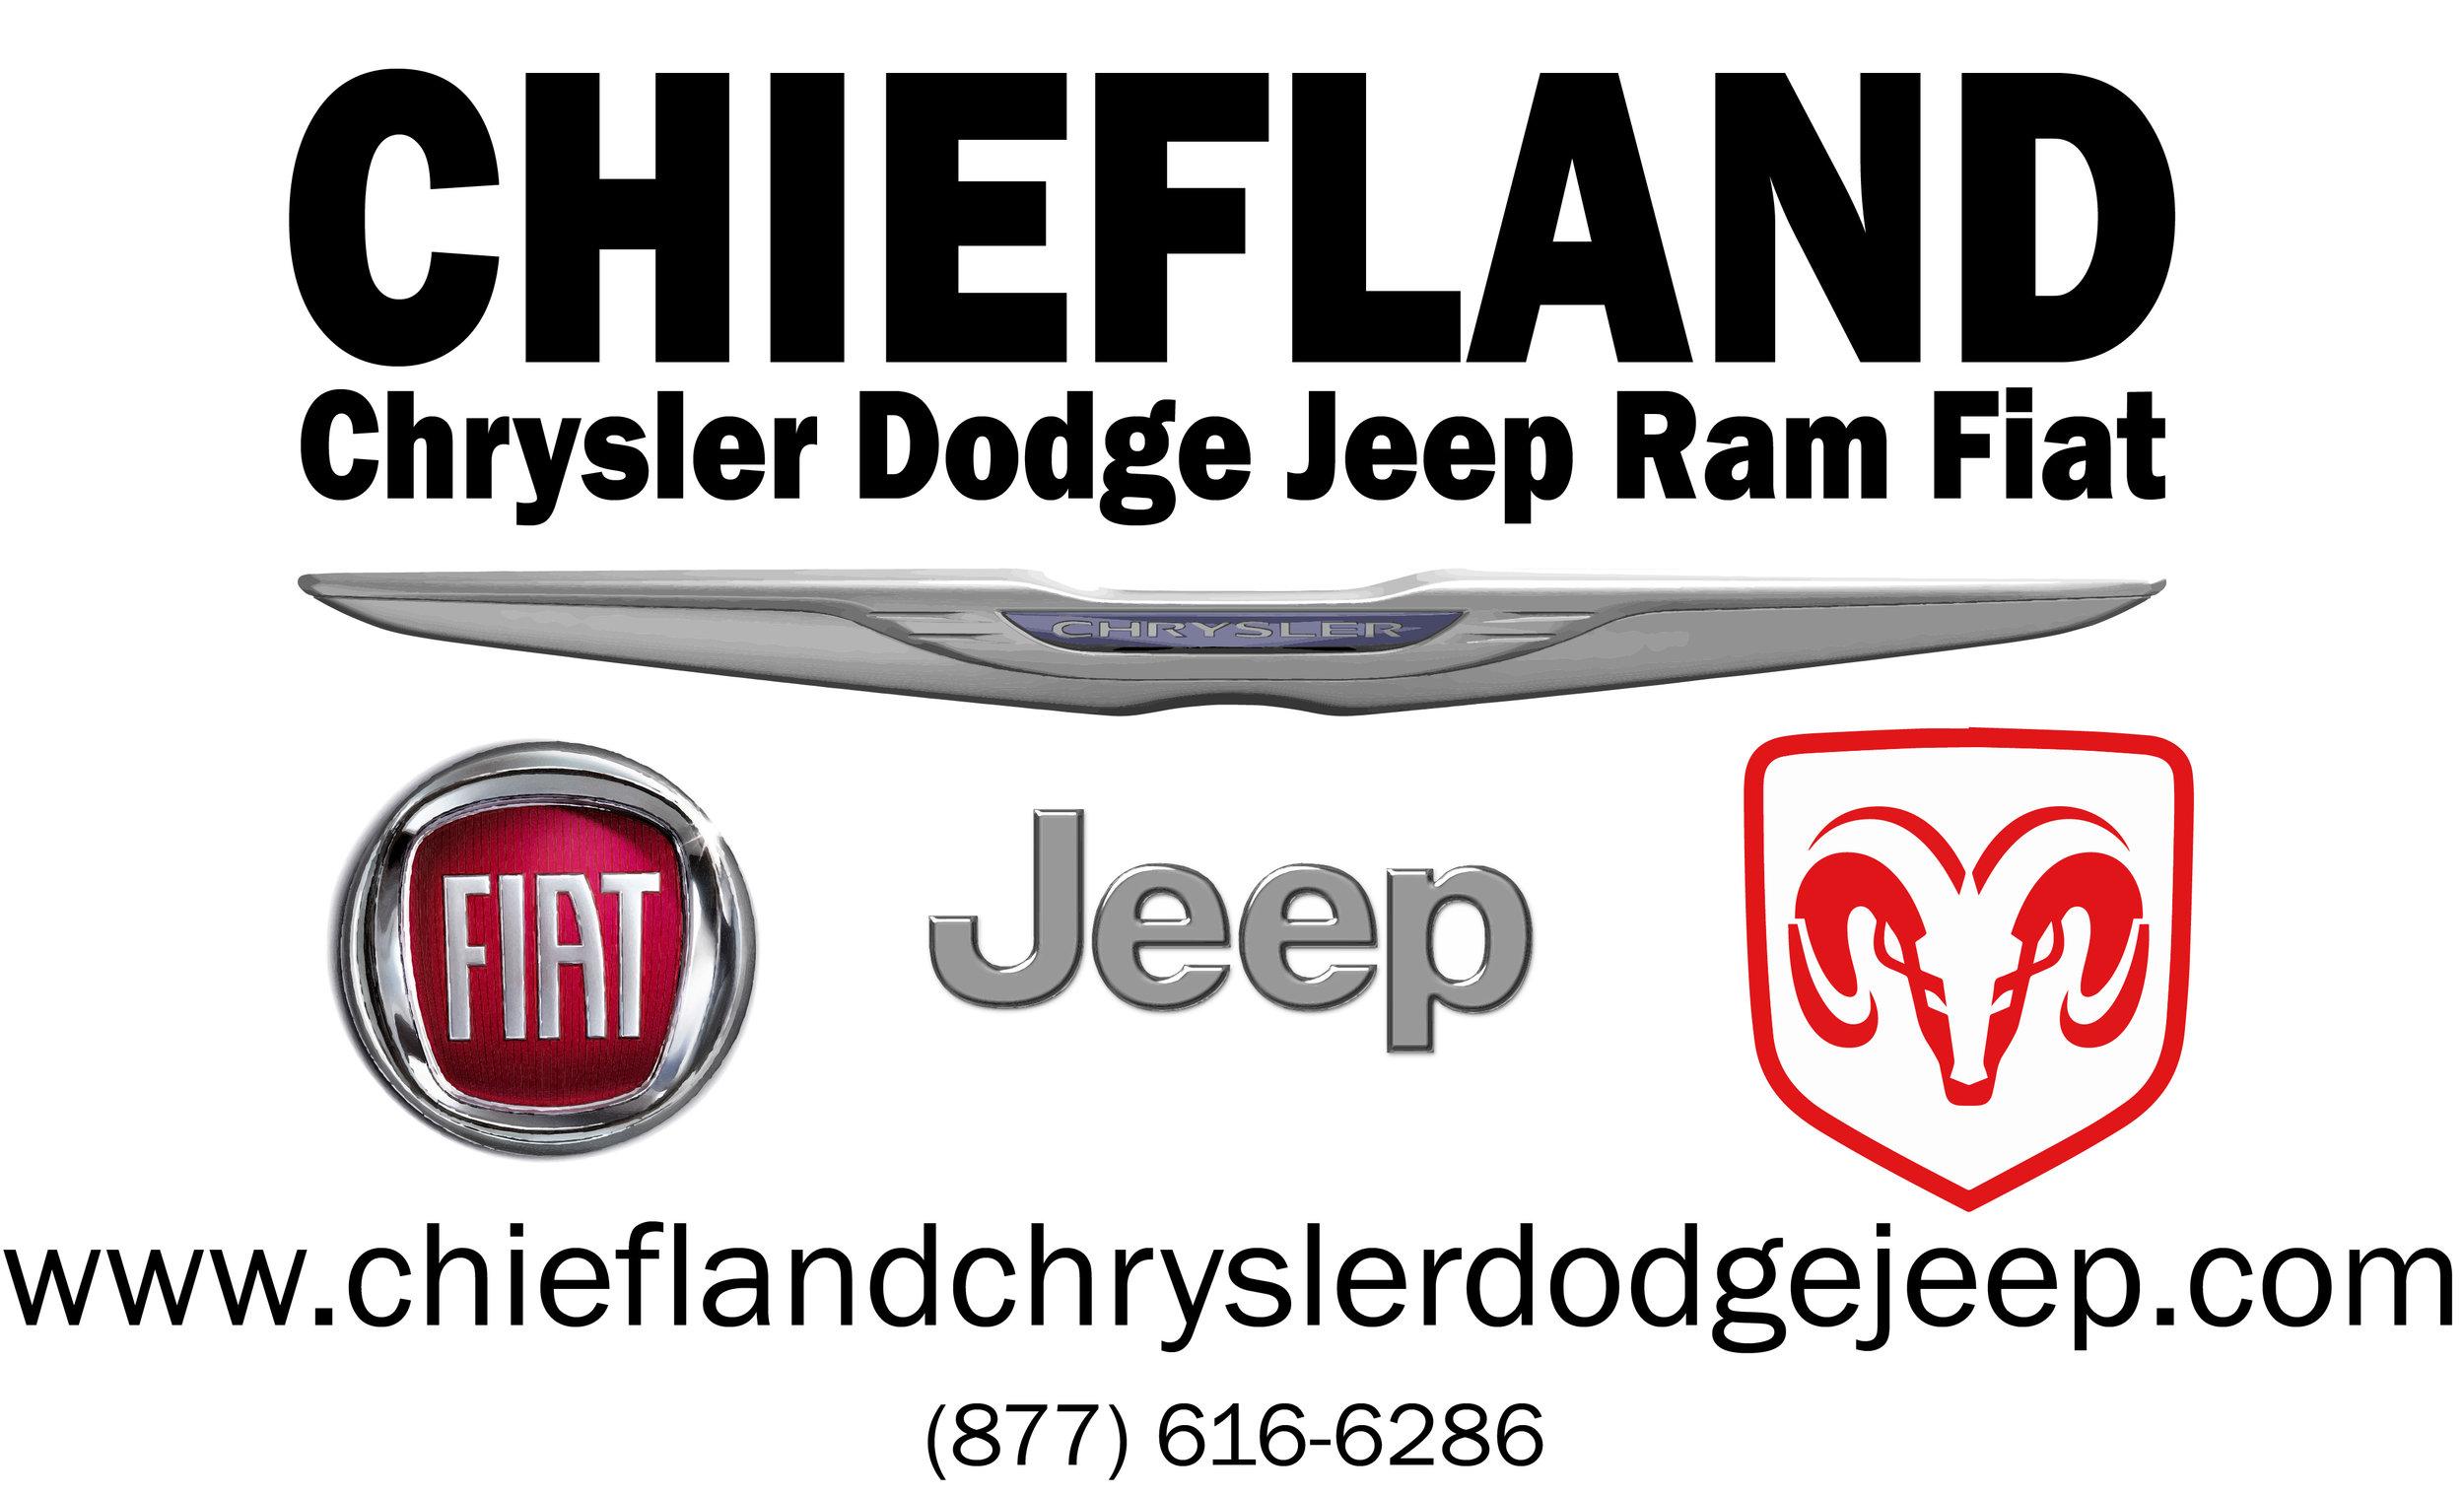 ChieflandDodge.jpg